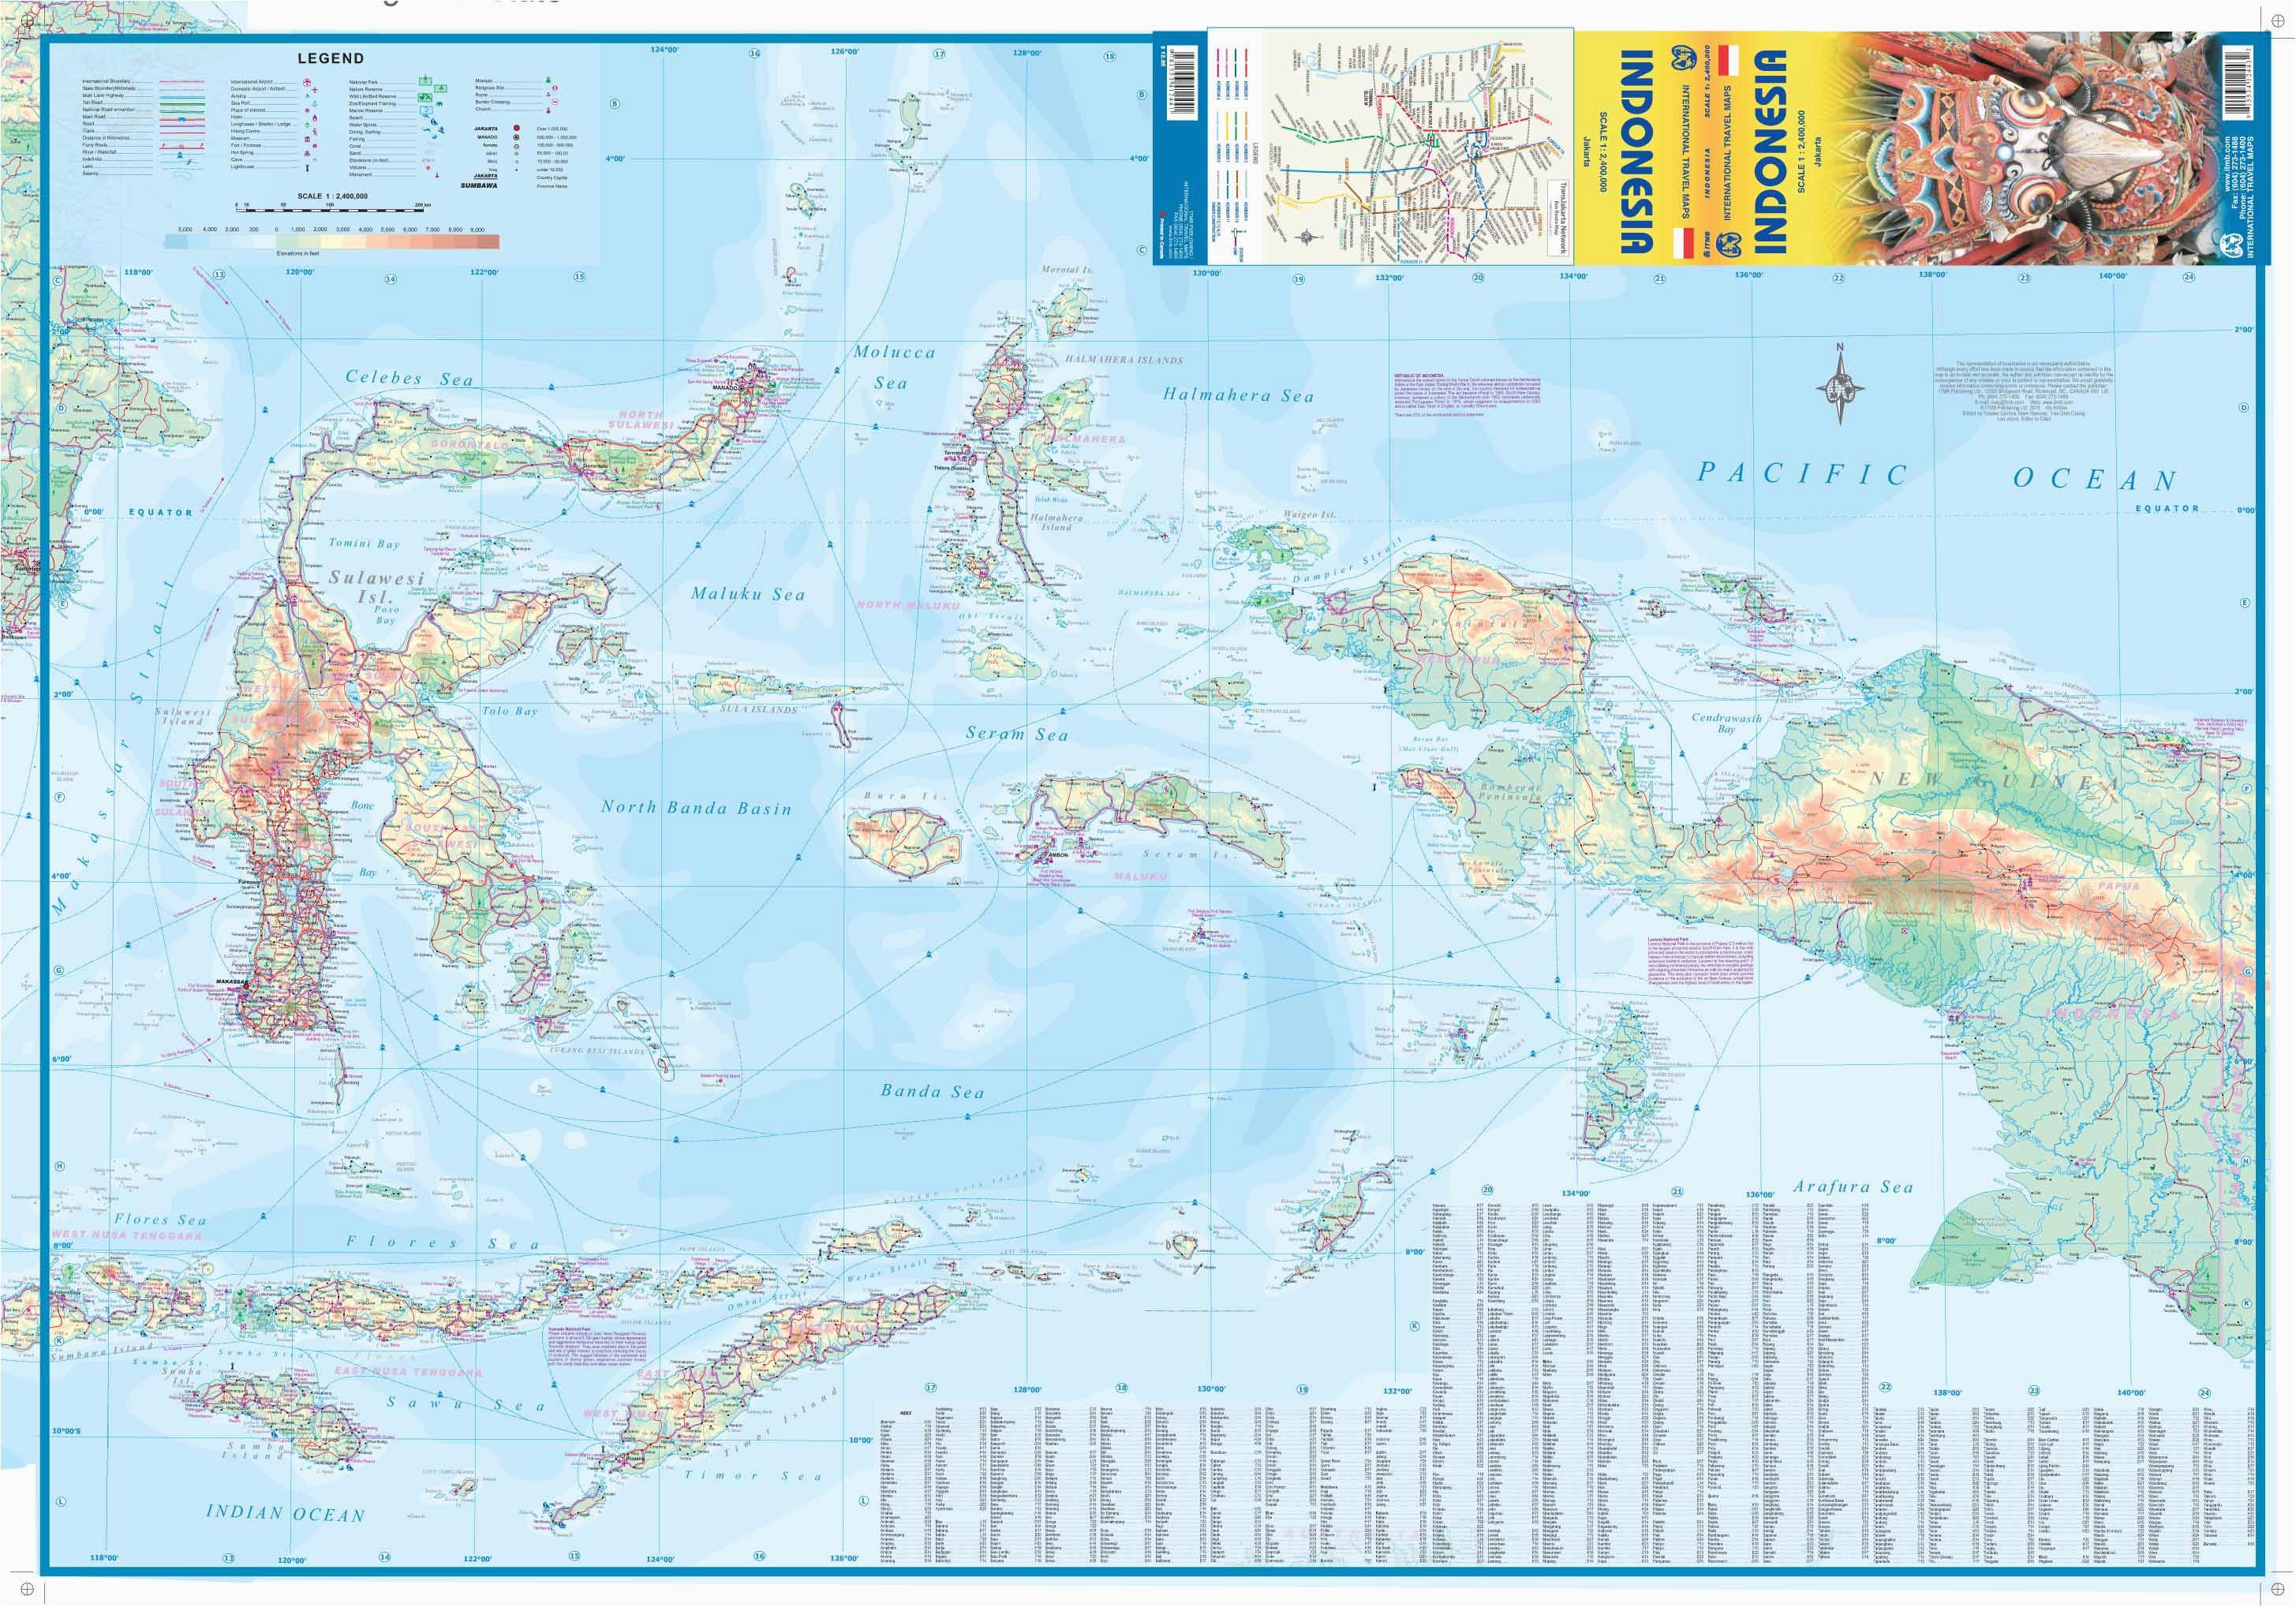 California Road Conditions Map California Road Conditions Map Best Maps for Travel City Maps